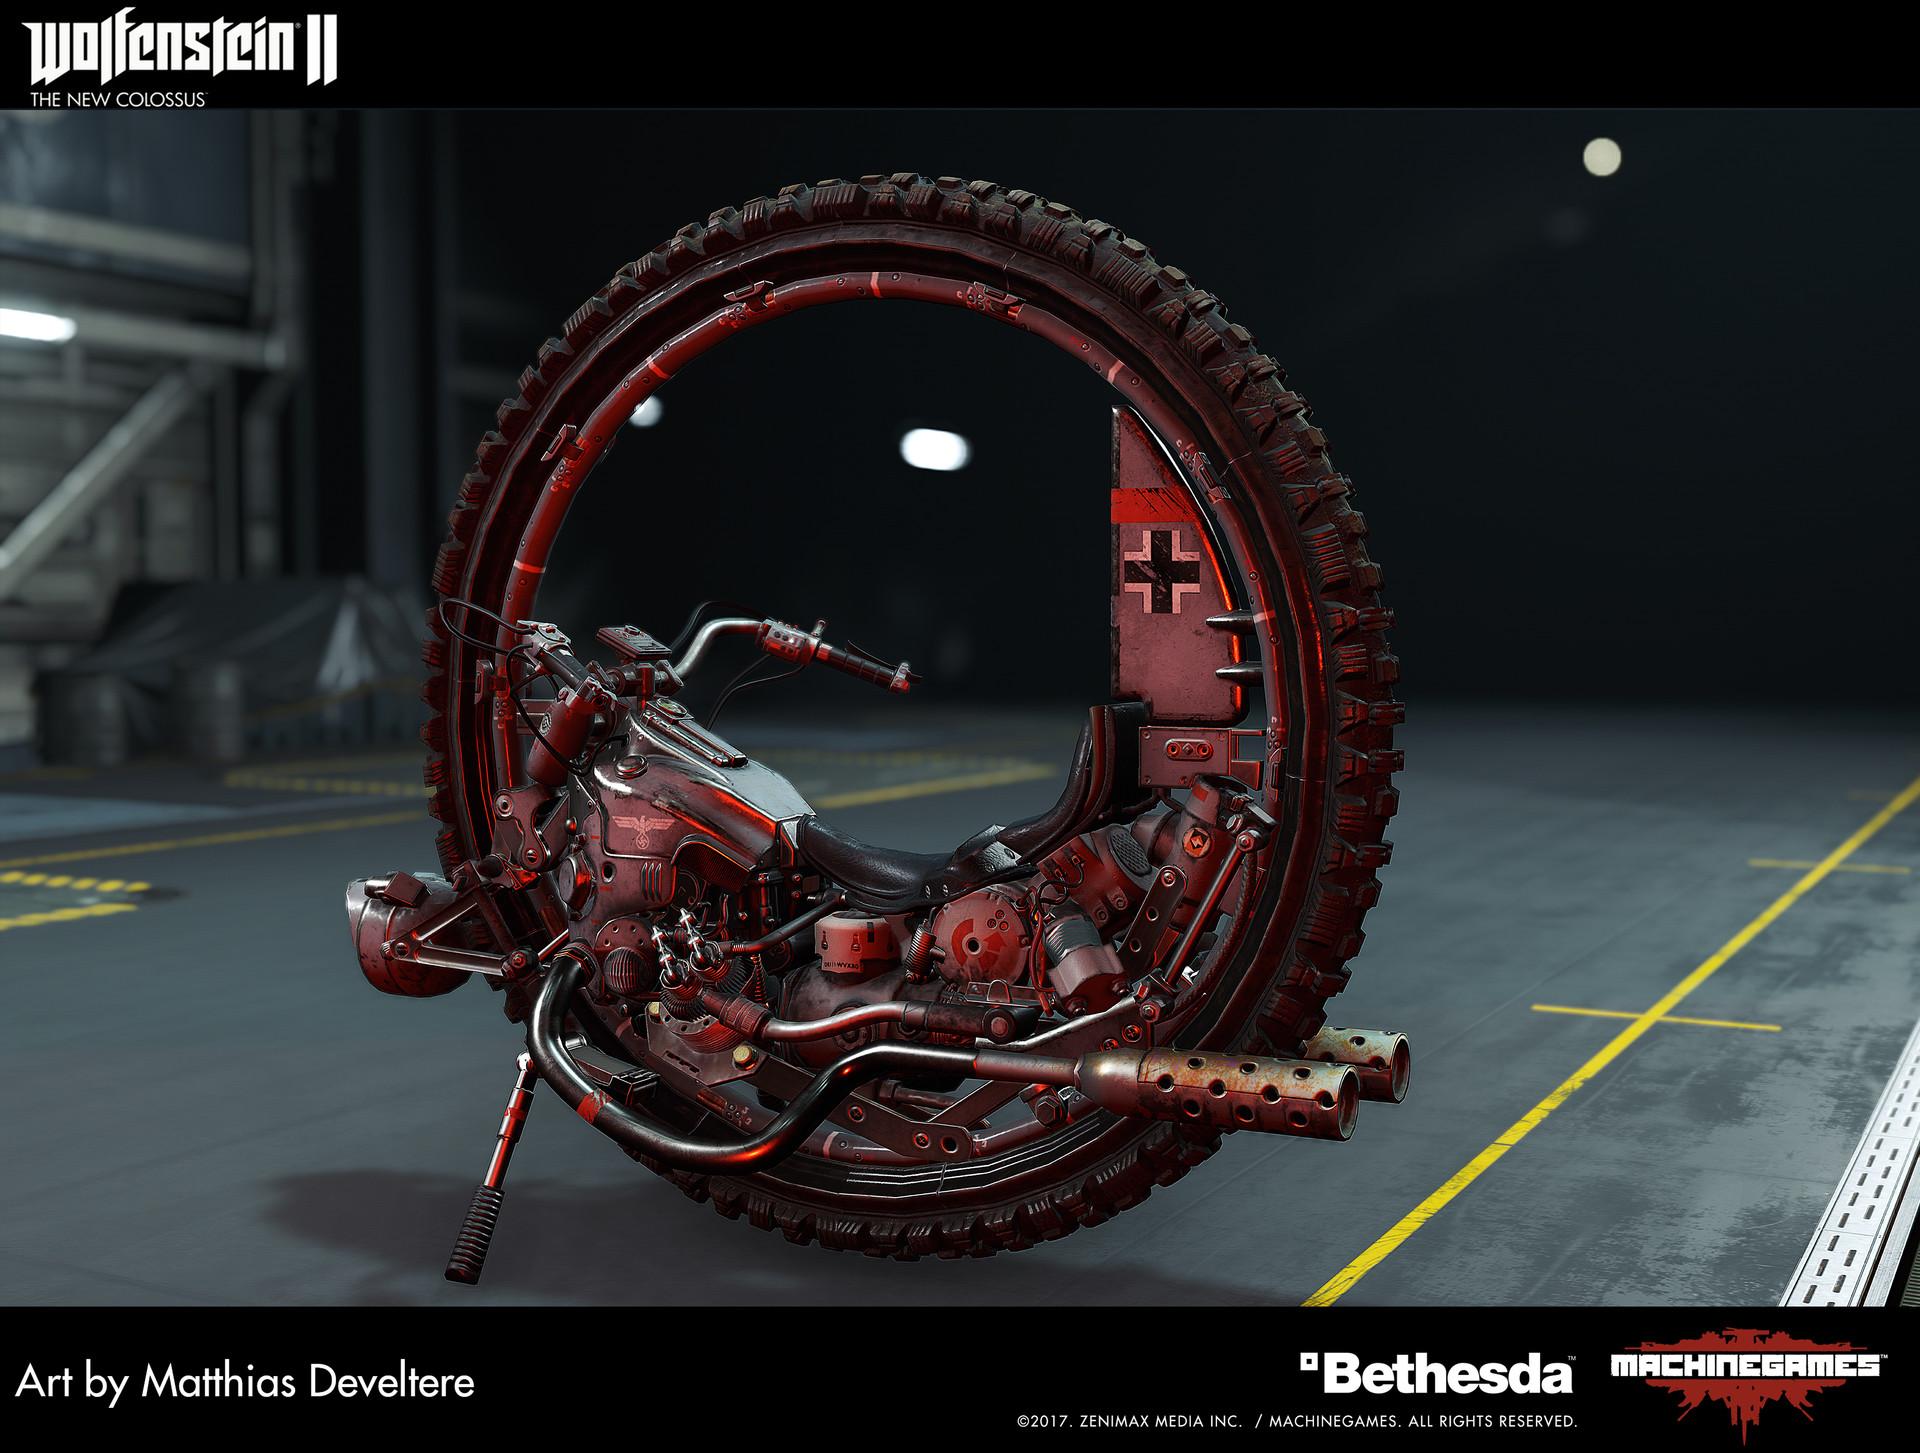 Matthias develtere matthias develtere monowheel a